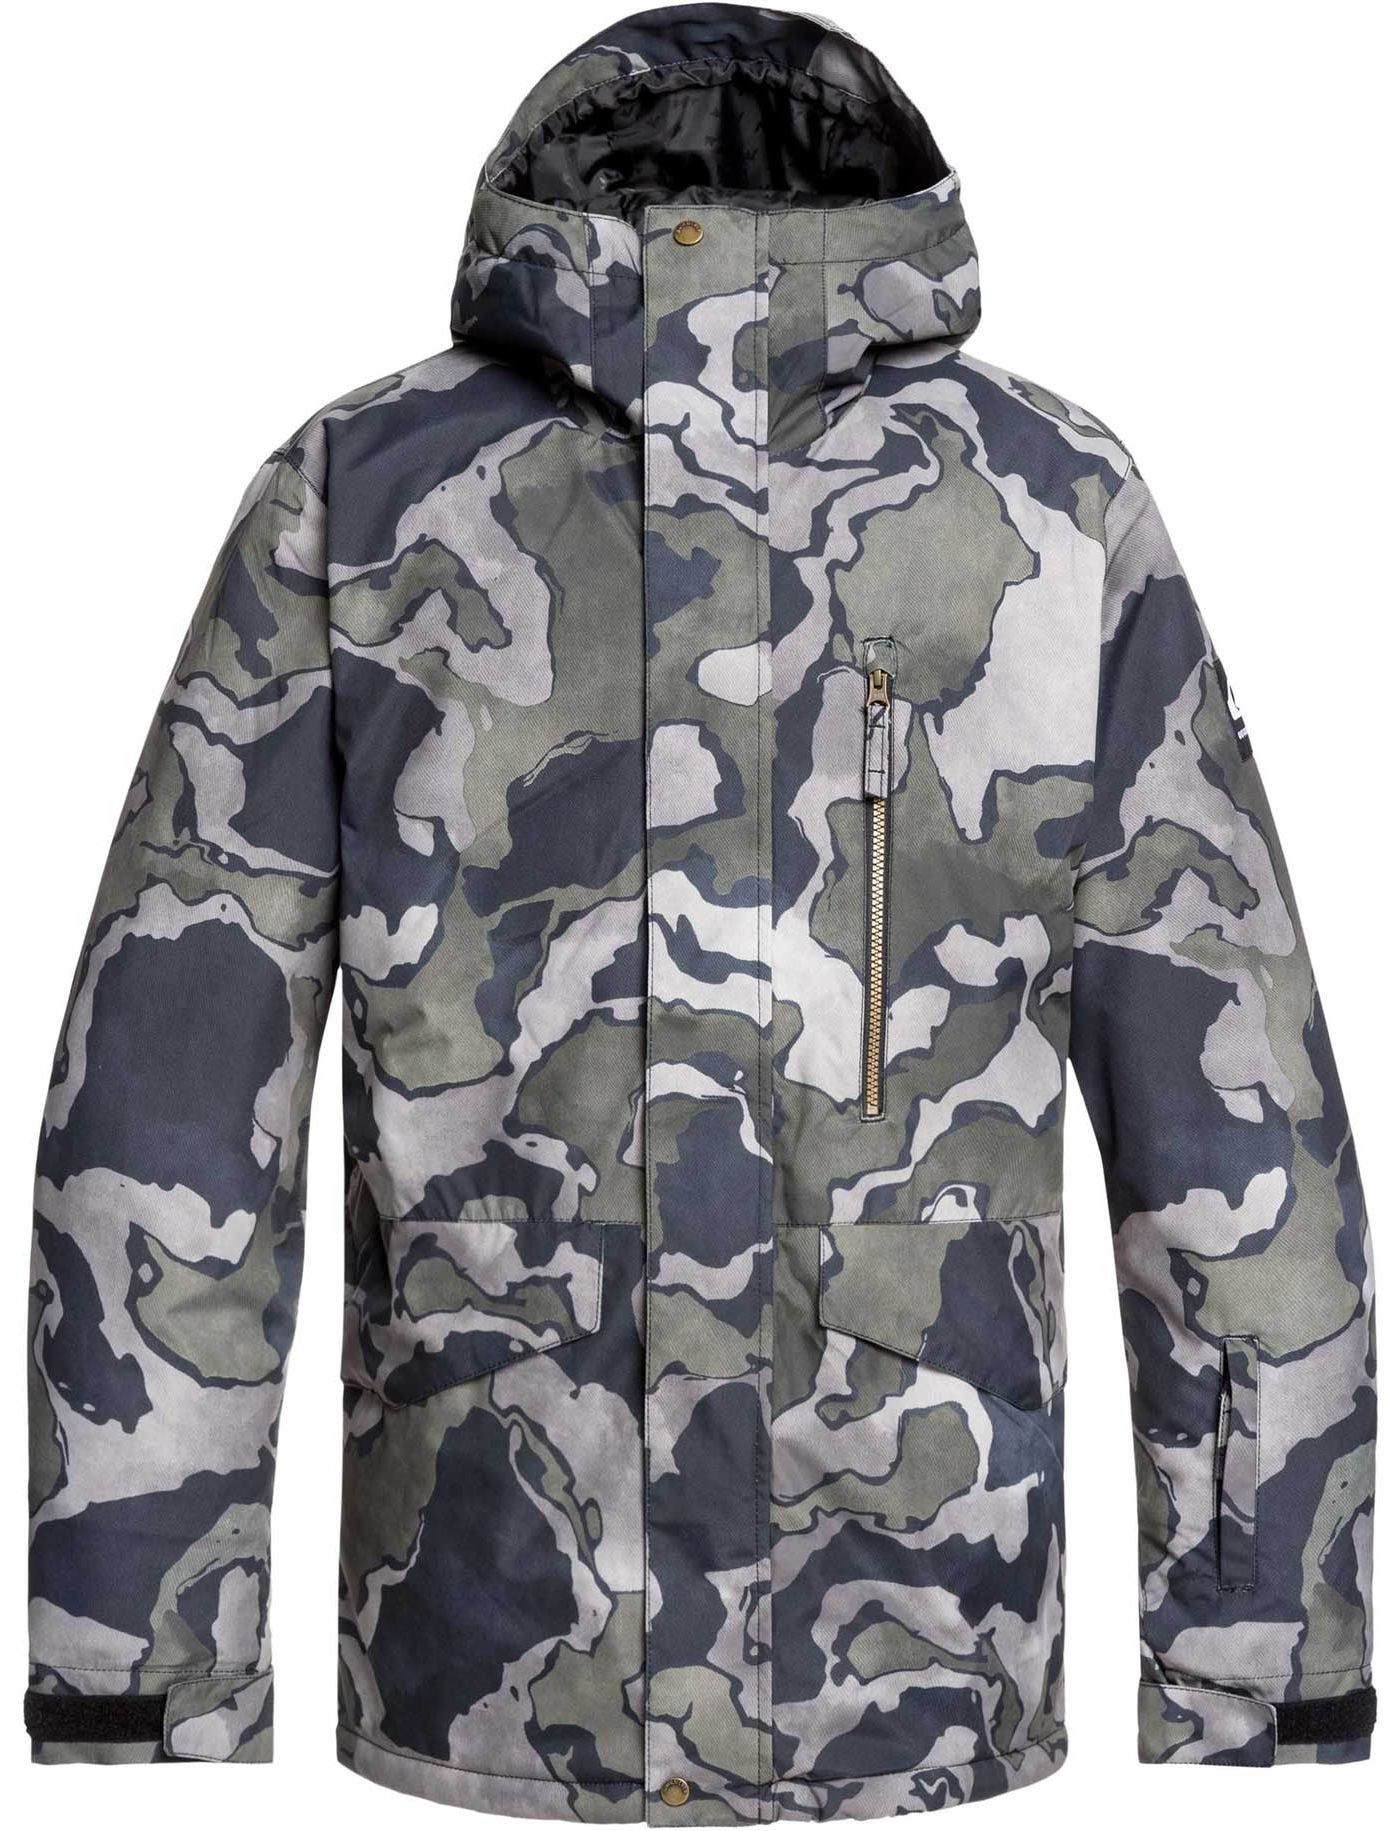 Quiksilver Men's Mission Printed Snow Jacket